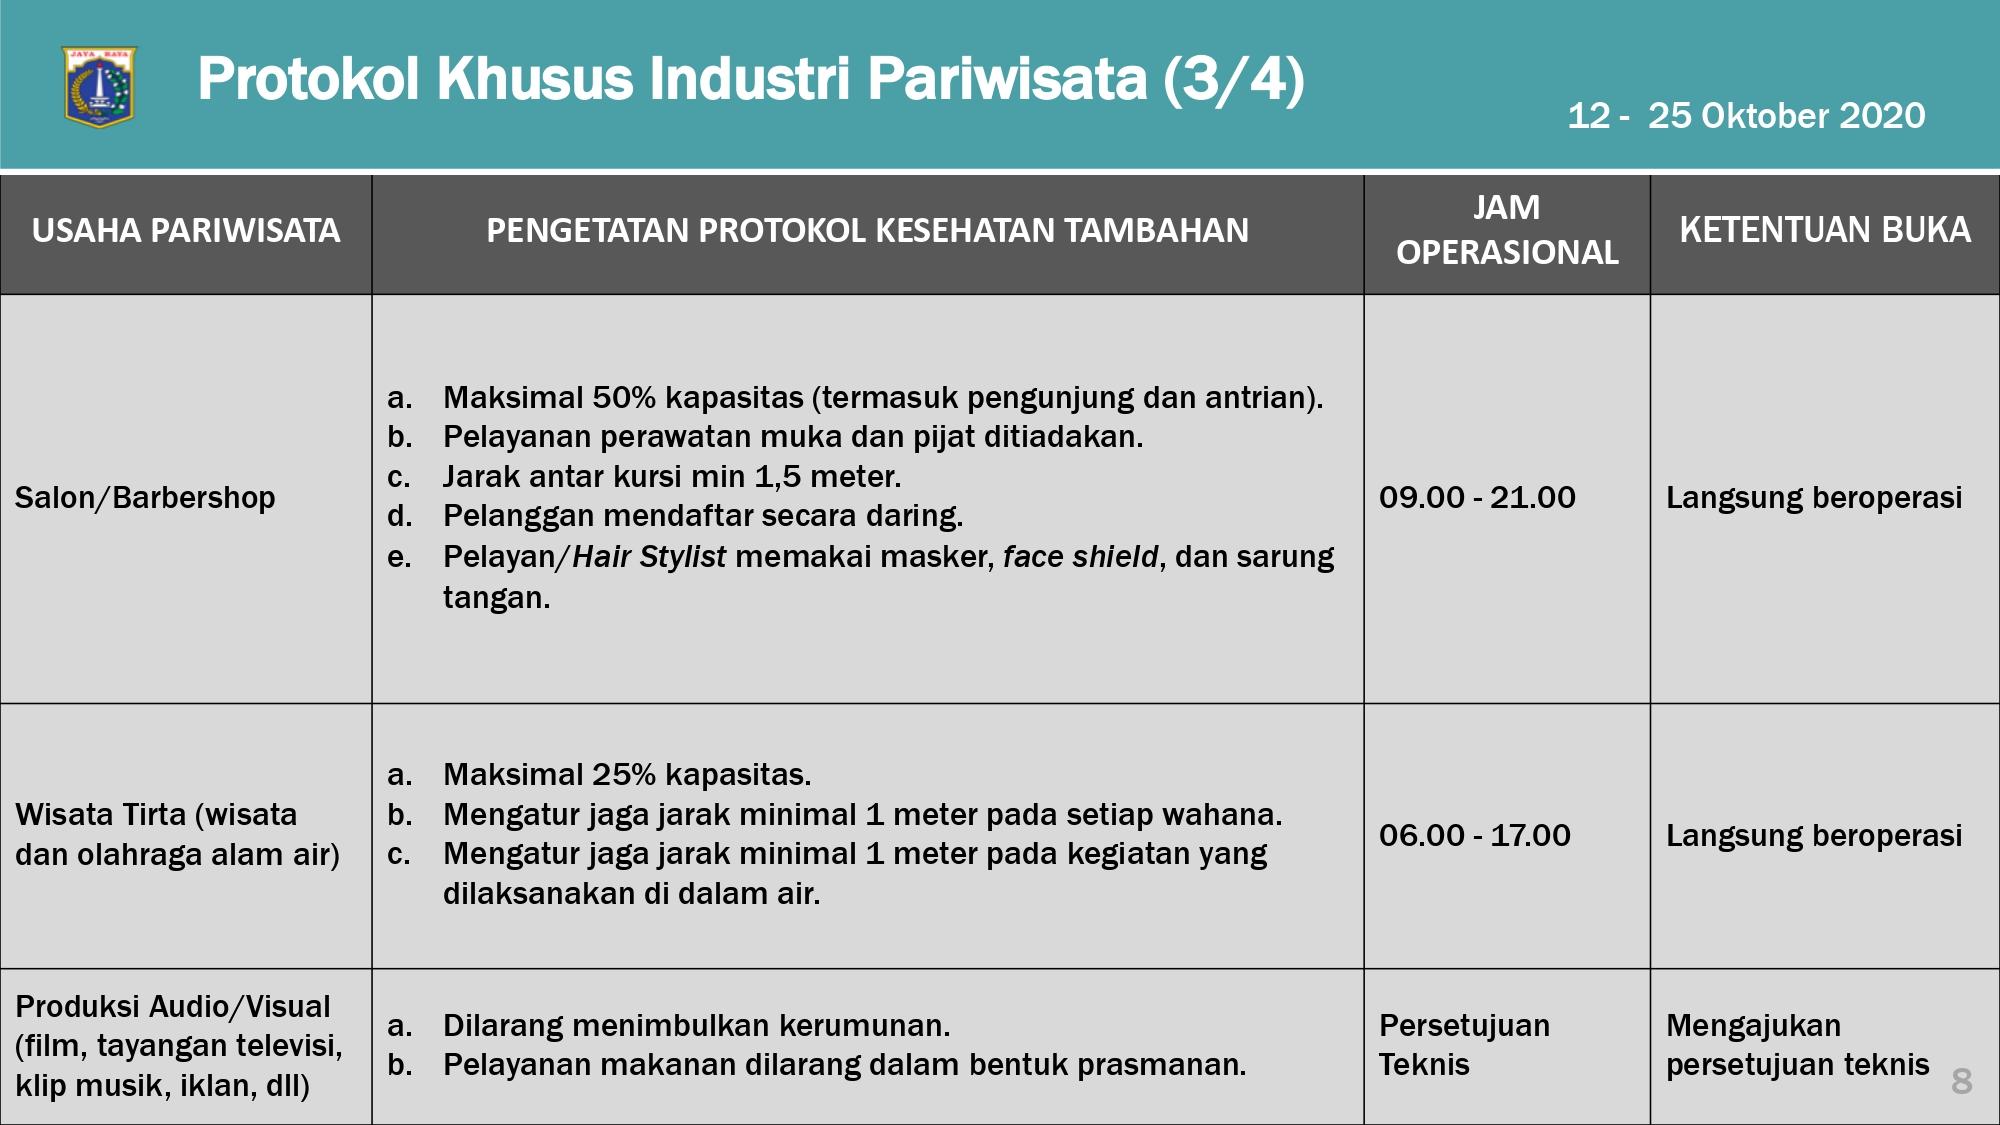 Pengaturan PSBB Transisi DKI Jakarta 12-25 Oktober 2020_page-0008